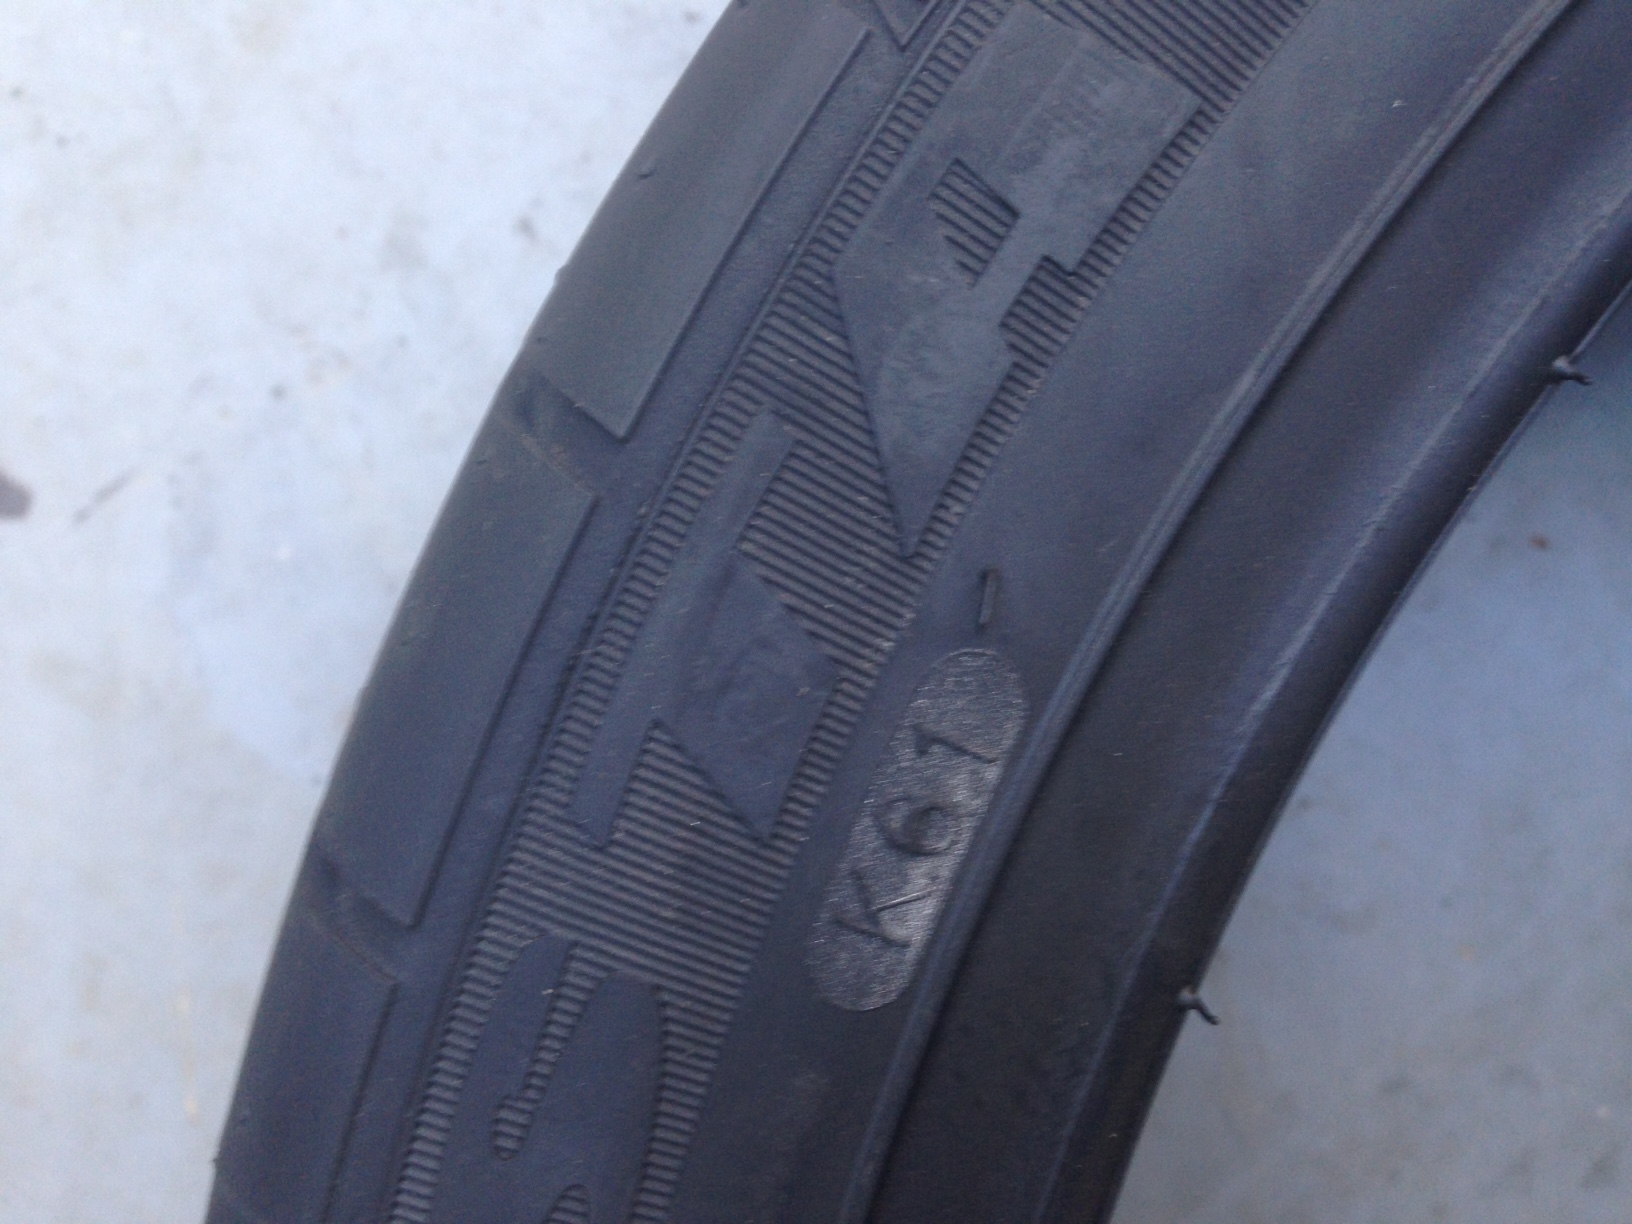 FOR SALE – Tarmac Rally Tyres (205/40/17)